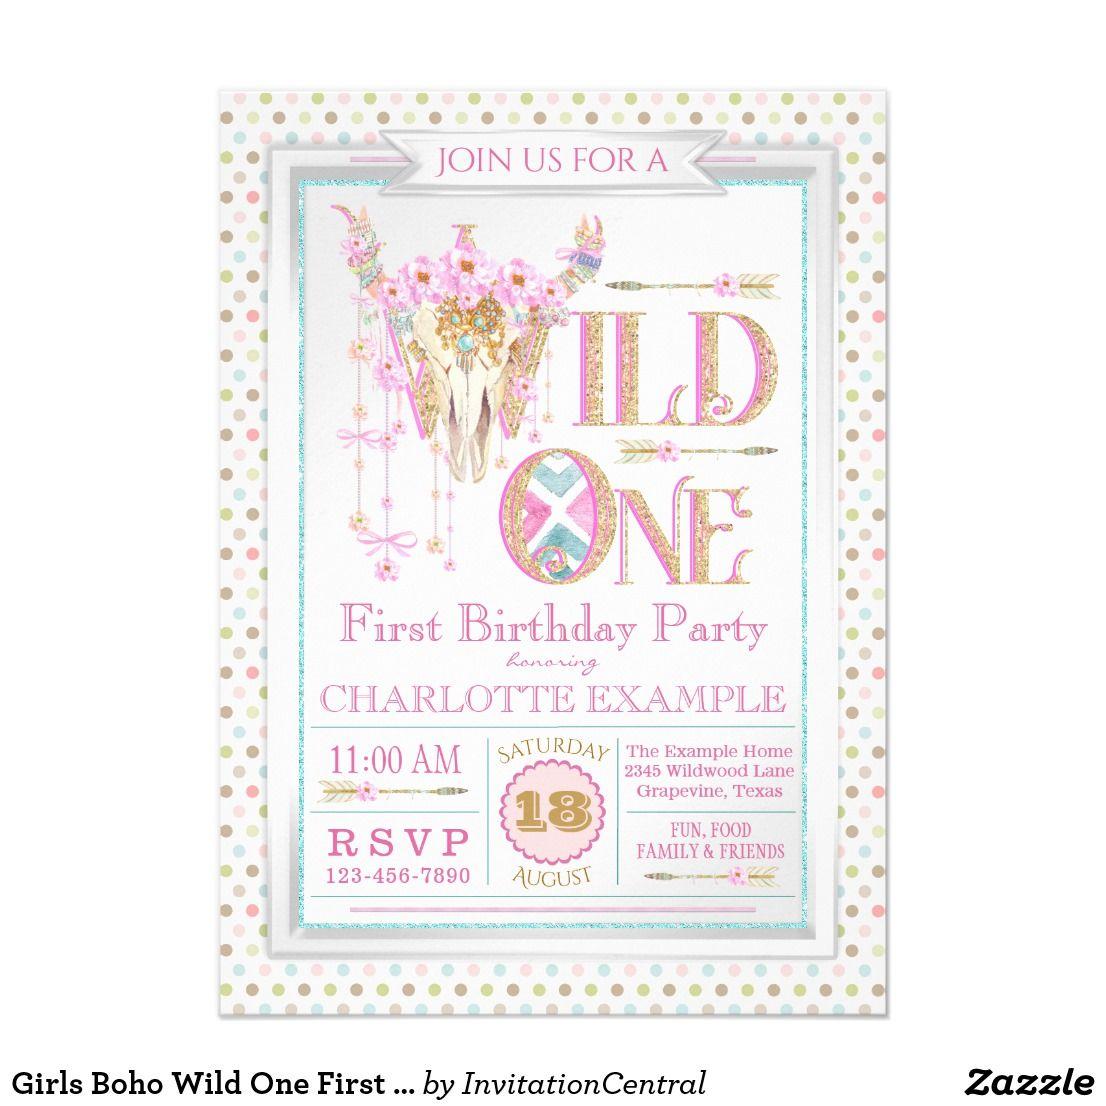 Girls Boho Wild One First Birthday Invitations | Invitations ...